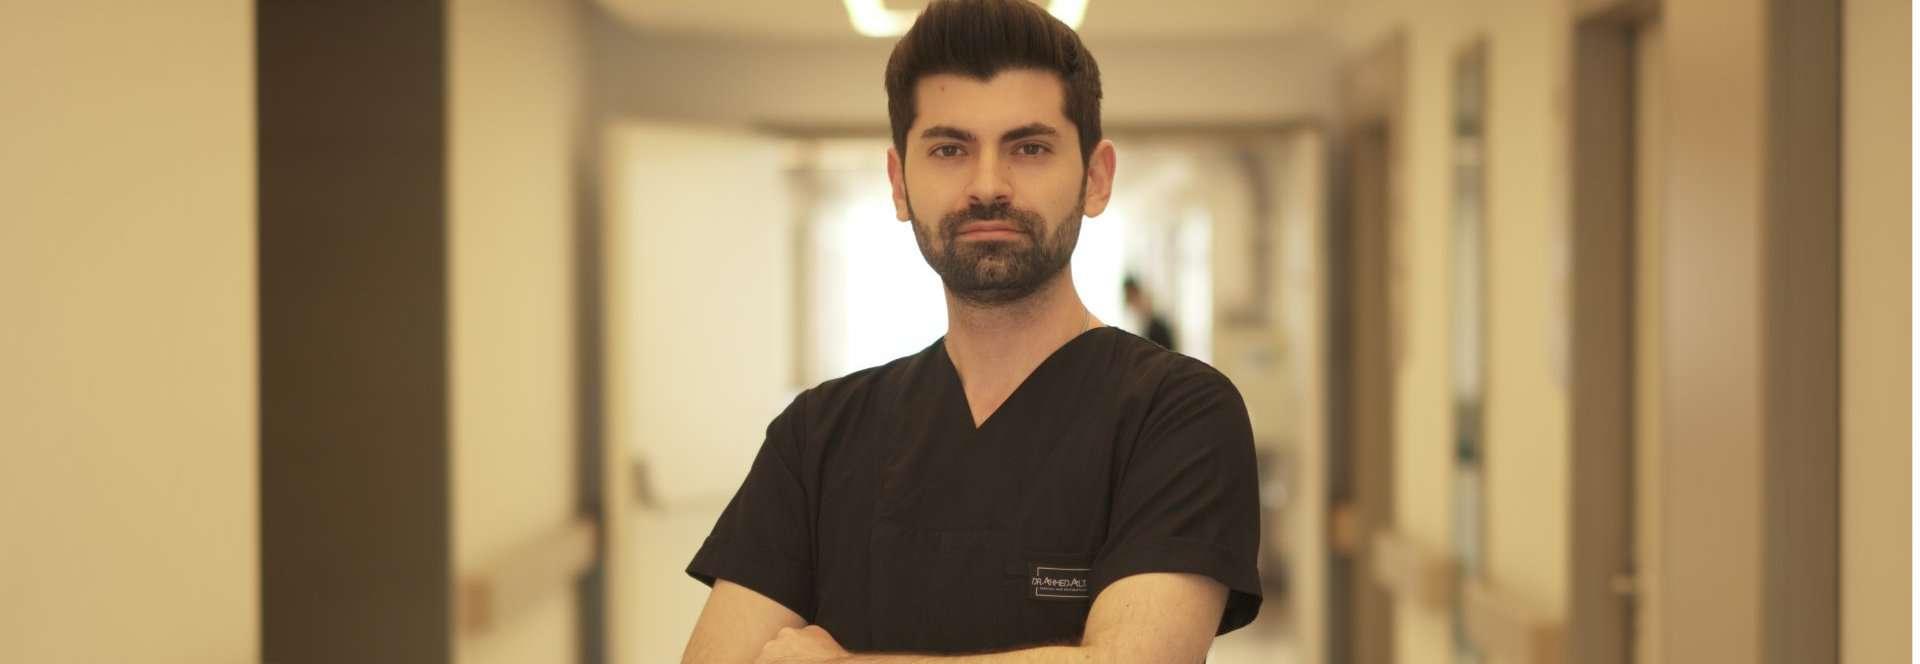 Dr. Altan